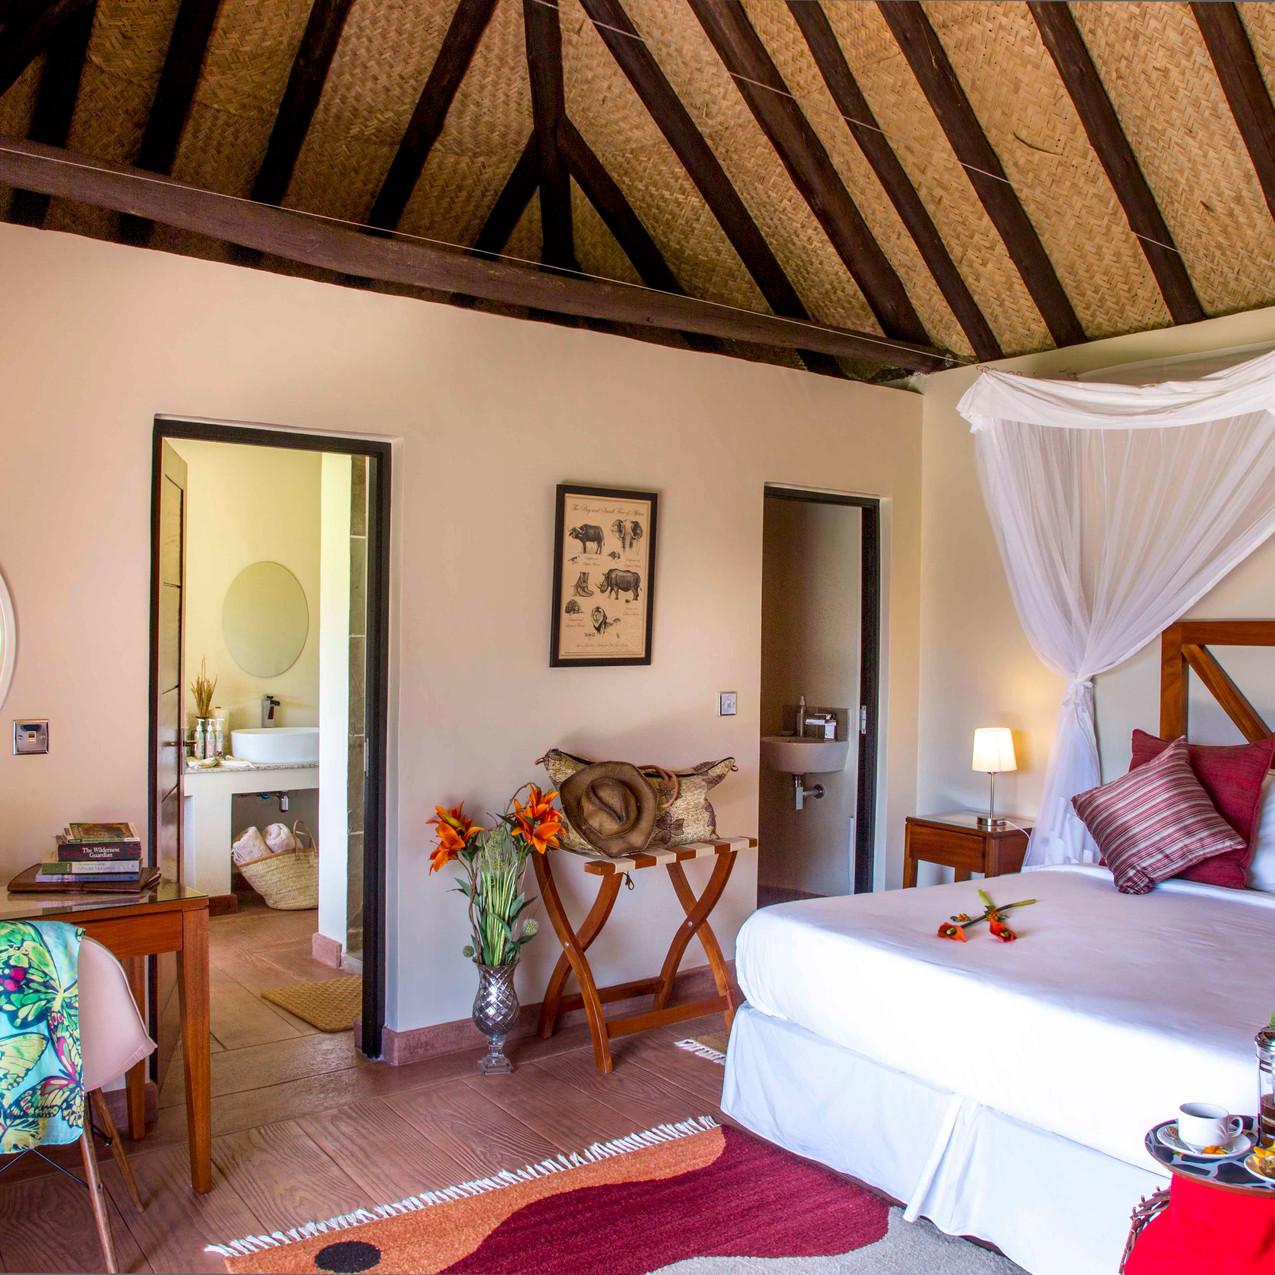 Spirit of the Masai Mara - room 1